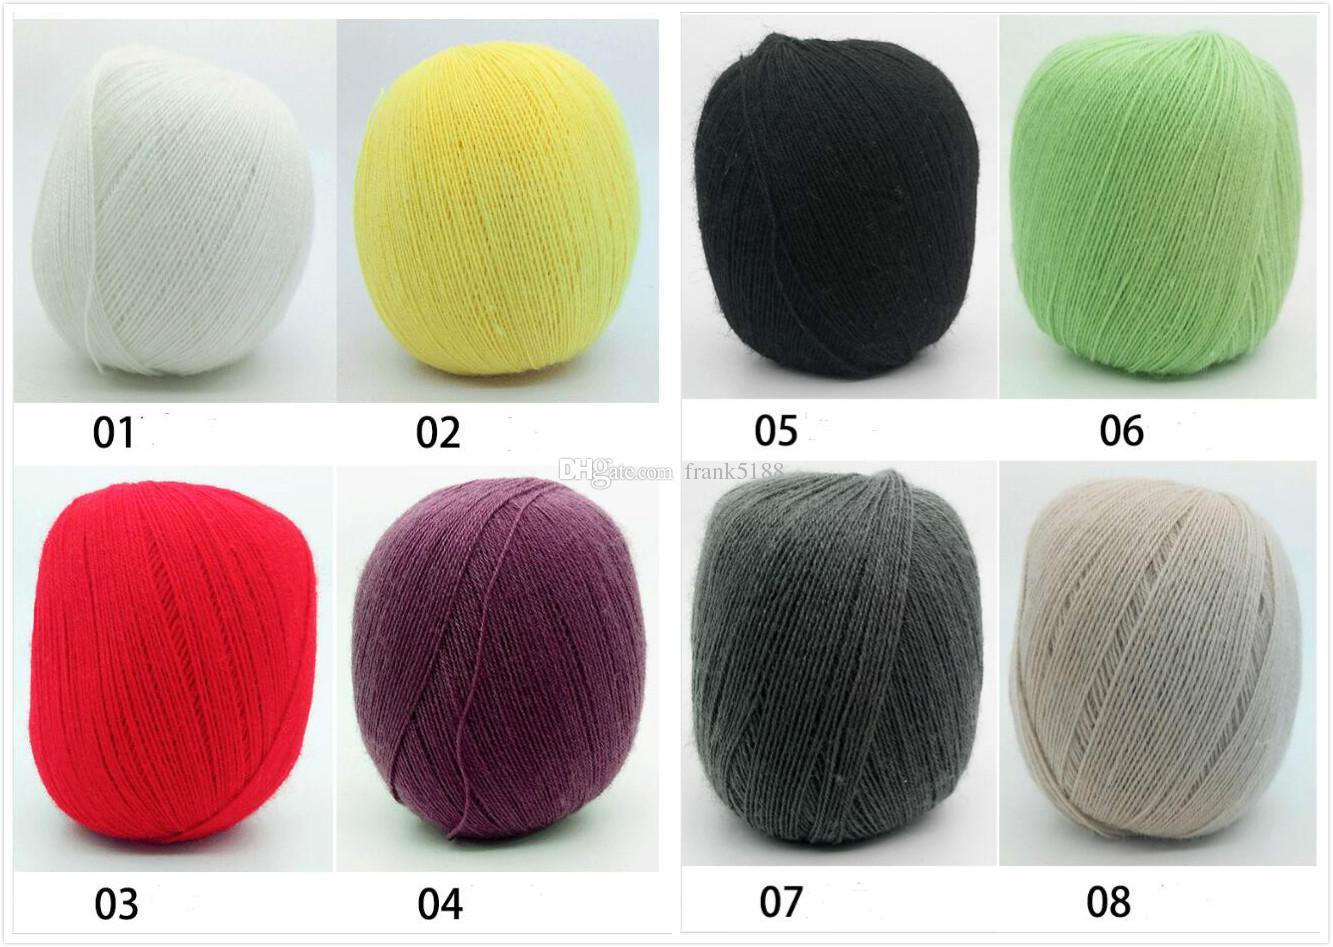 50g/ball Hand knitting Wool Yarn Dyed Acrylic Cashmere Bulky Yarn Crochet Thread For Baby Clothes Super Chunky Wool Yarn